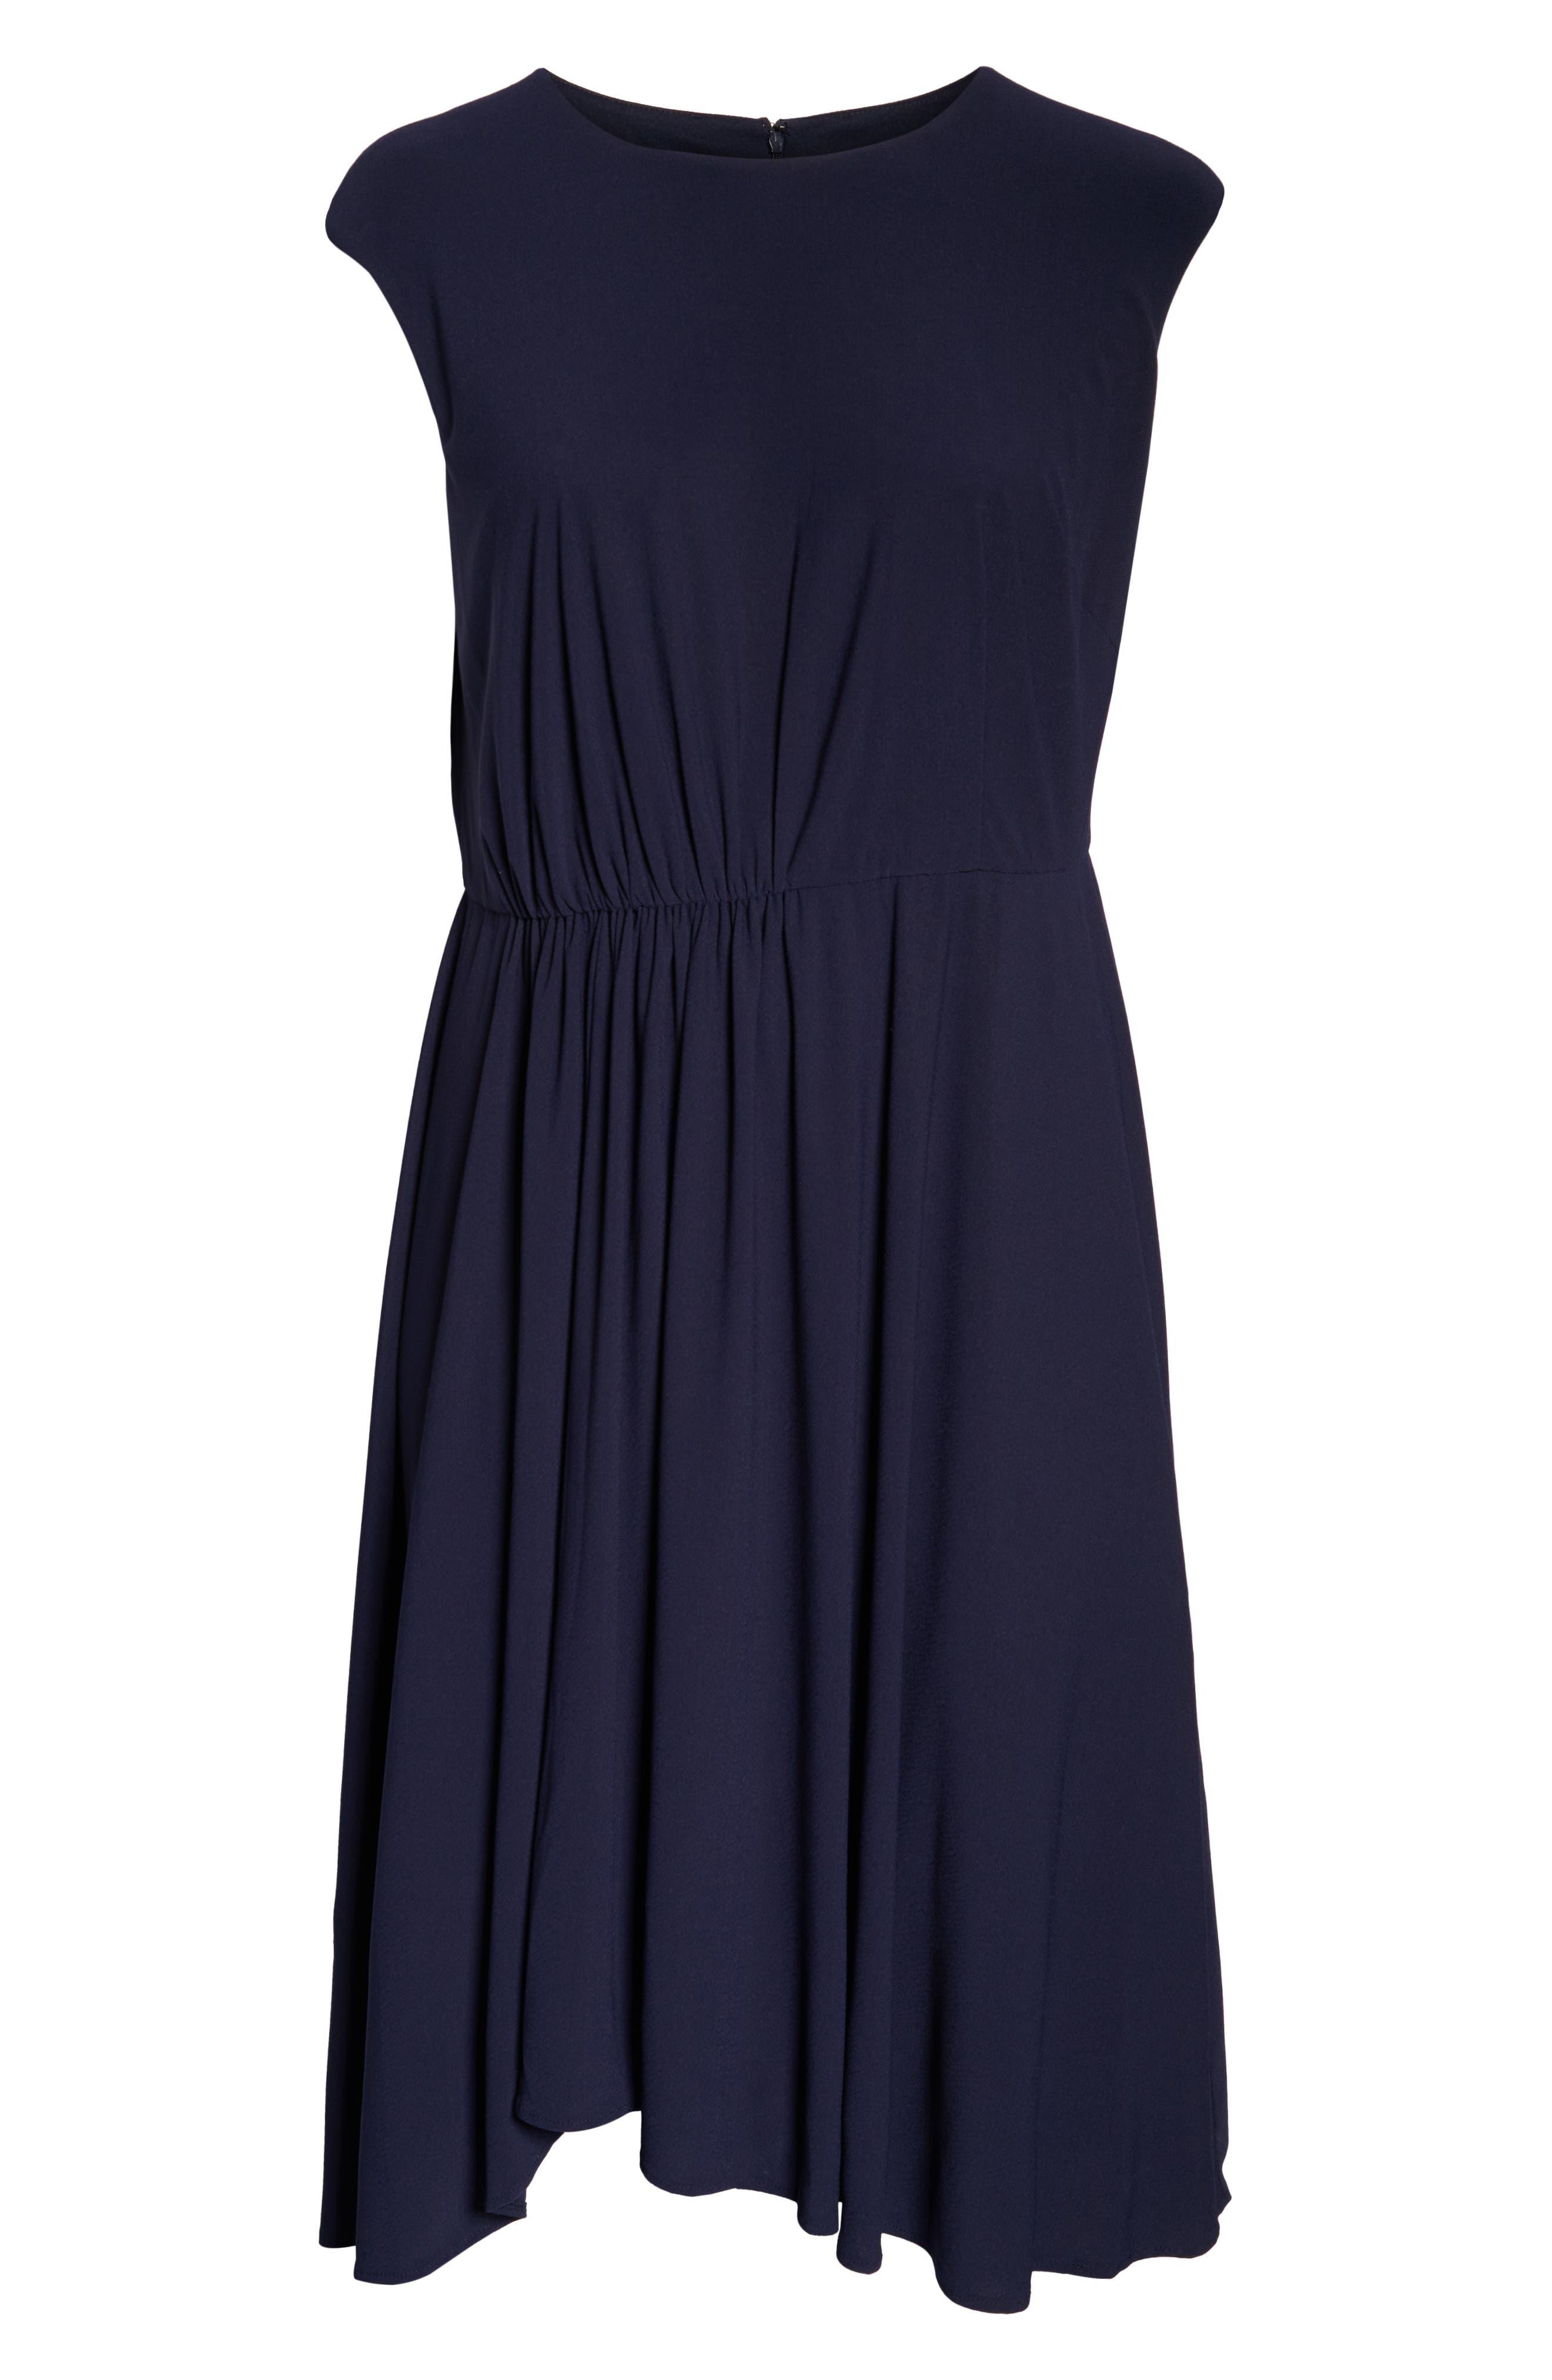 MAGGY LONDON, Crystal Side Drape Crepe Midi Dress, Alternate thumbnail 3, color, 460